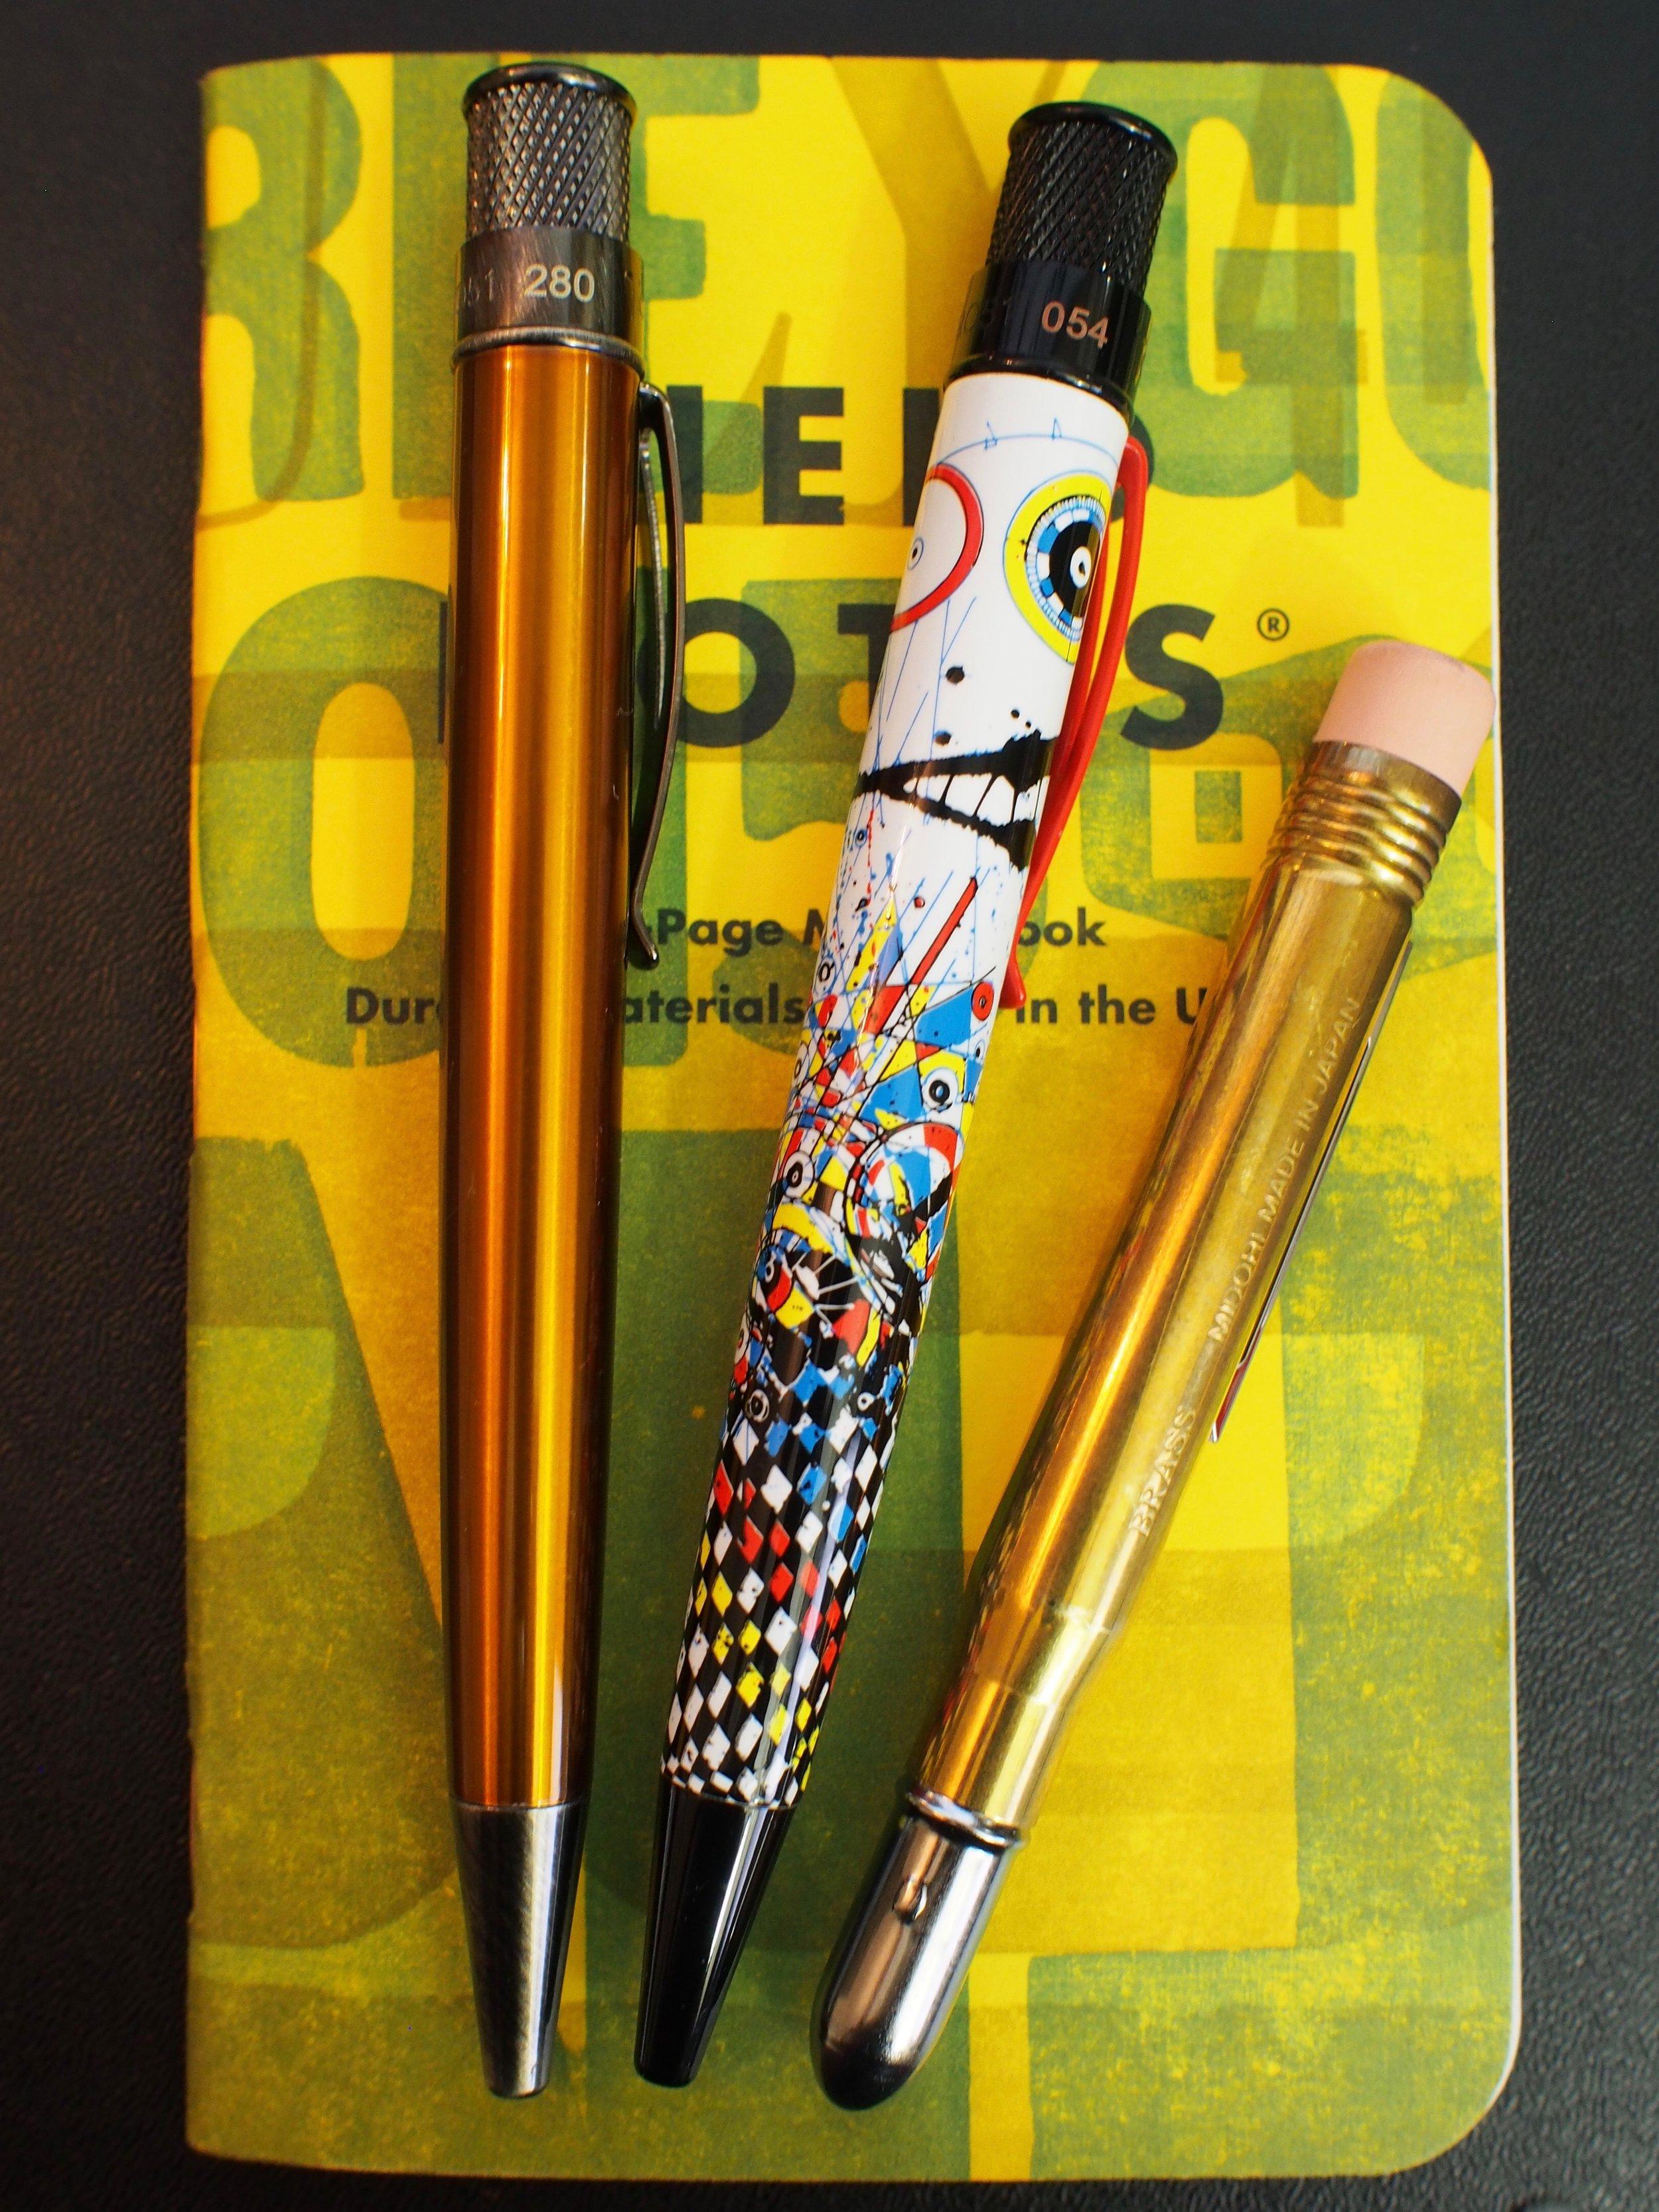 Retro 51 Pen Addict (L) and Joey Feldman (M)